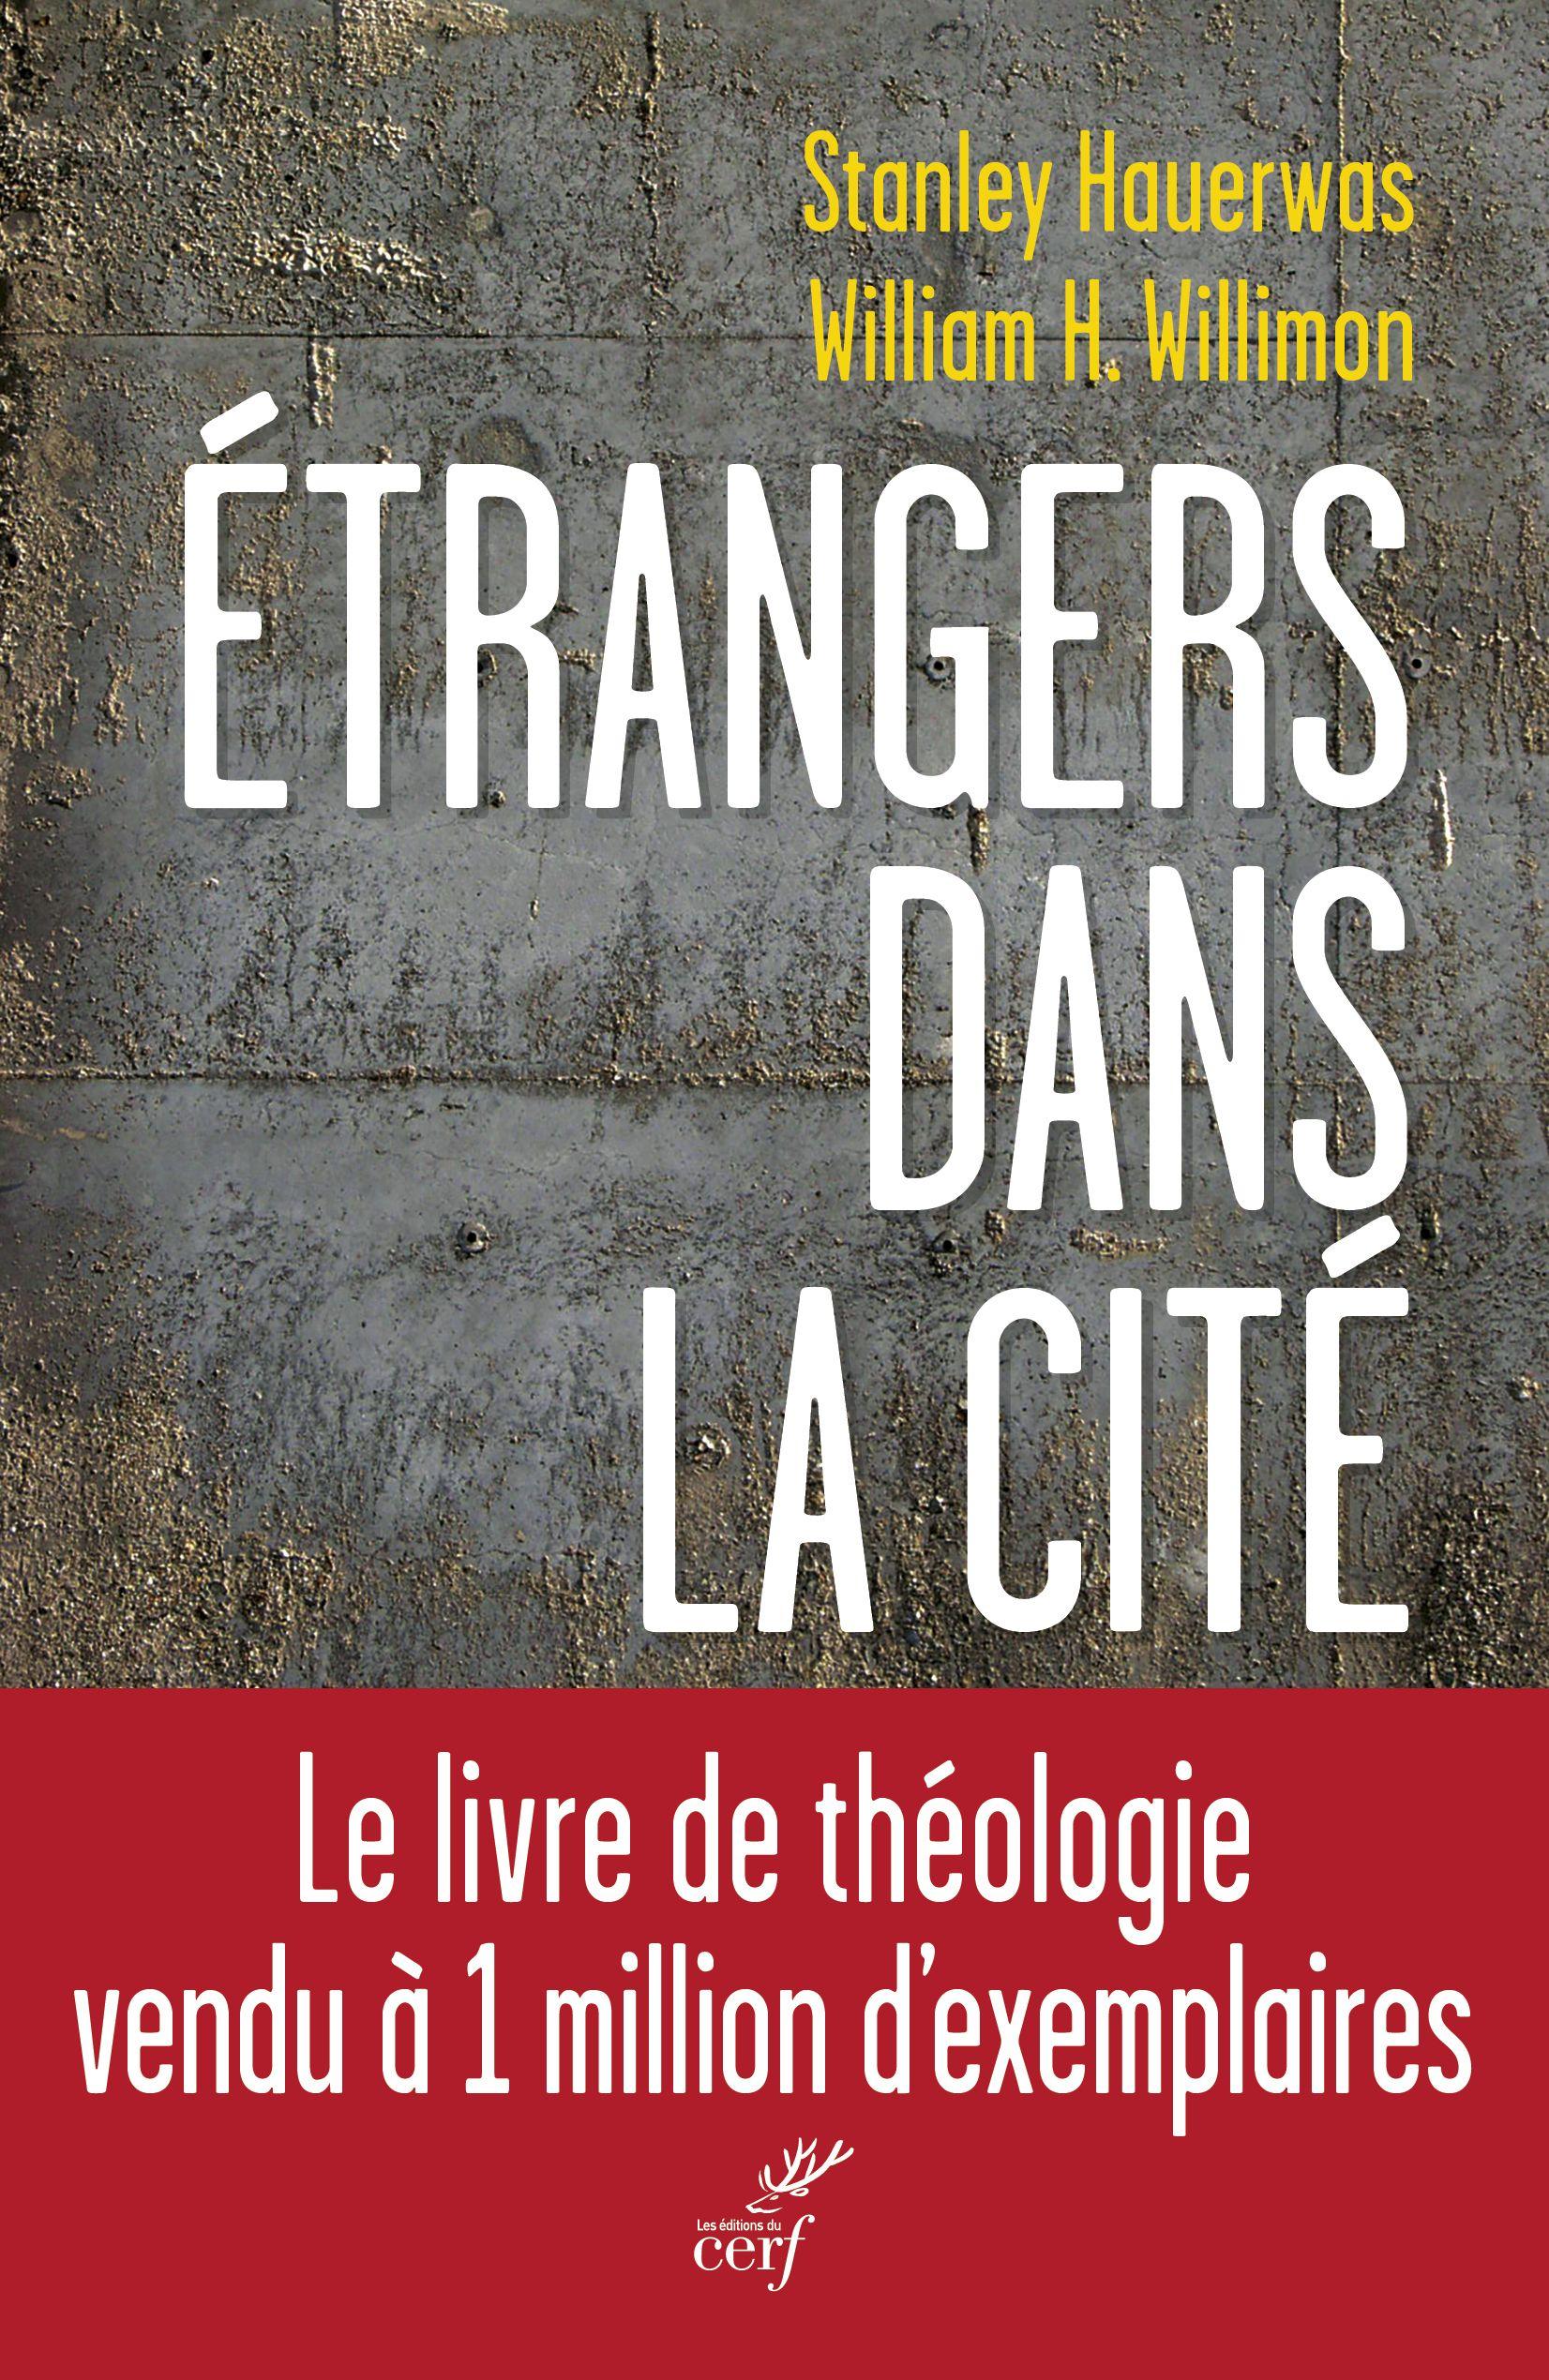 Etrangers Dans La Cite Stanley Hauerwas Et William H Willimon Theologie La Cite Livre Numerique